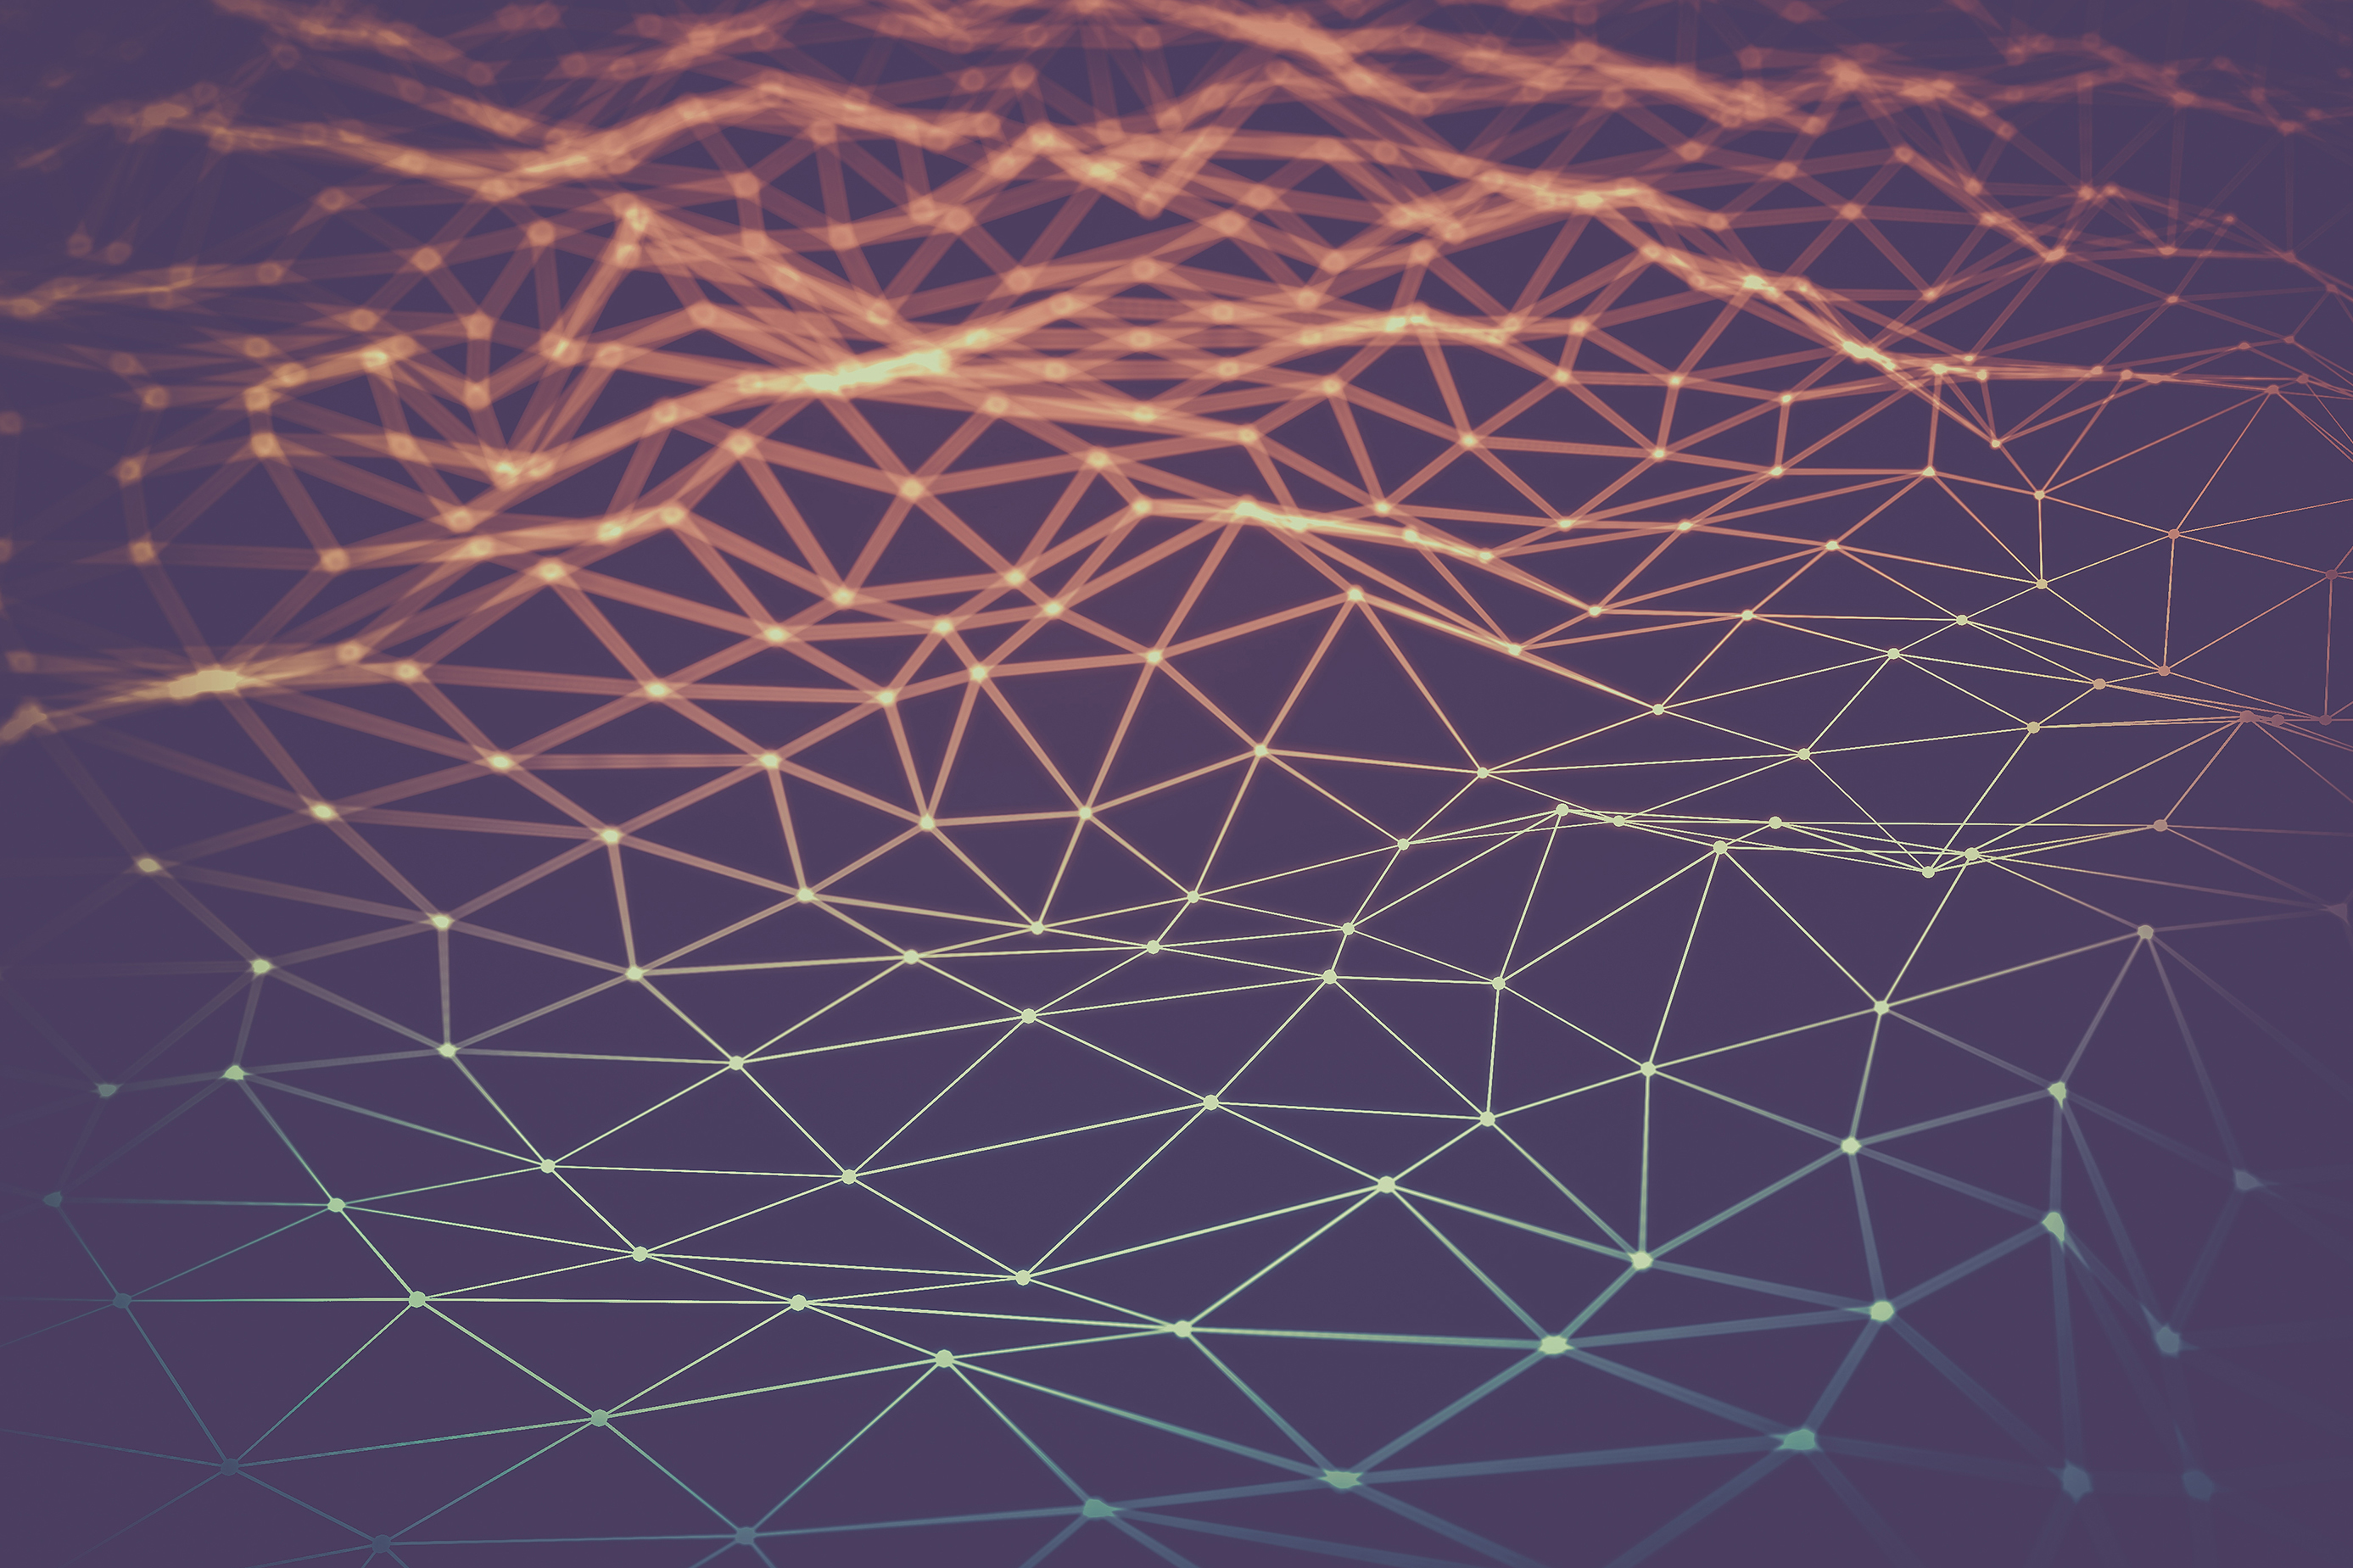 Adobe ist Leader im Gartner Magic Quadrant für digitale Erlebnisplattformen